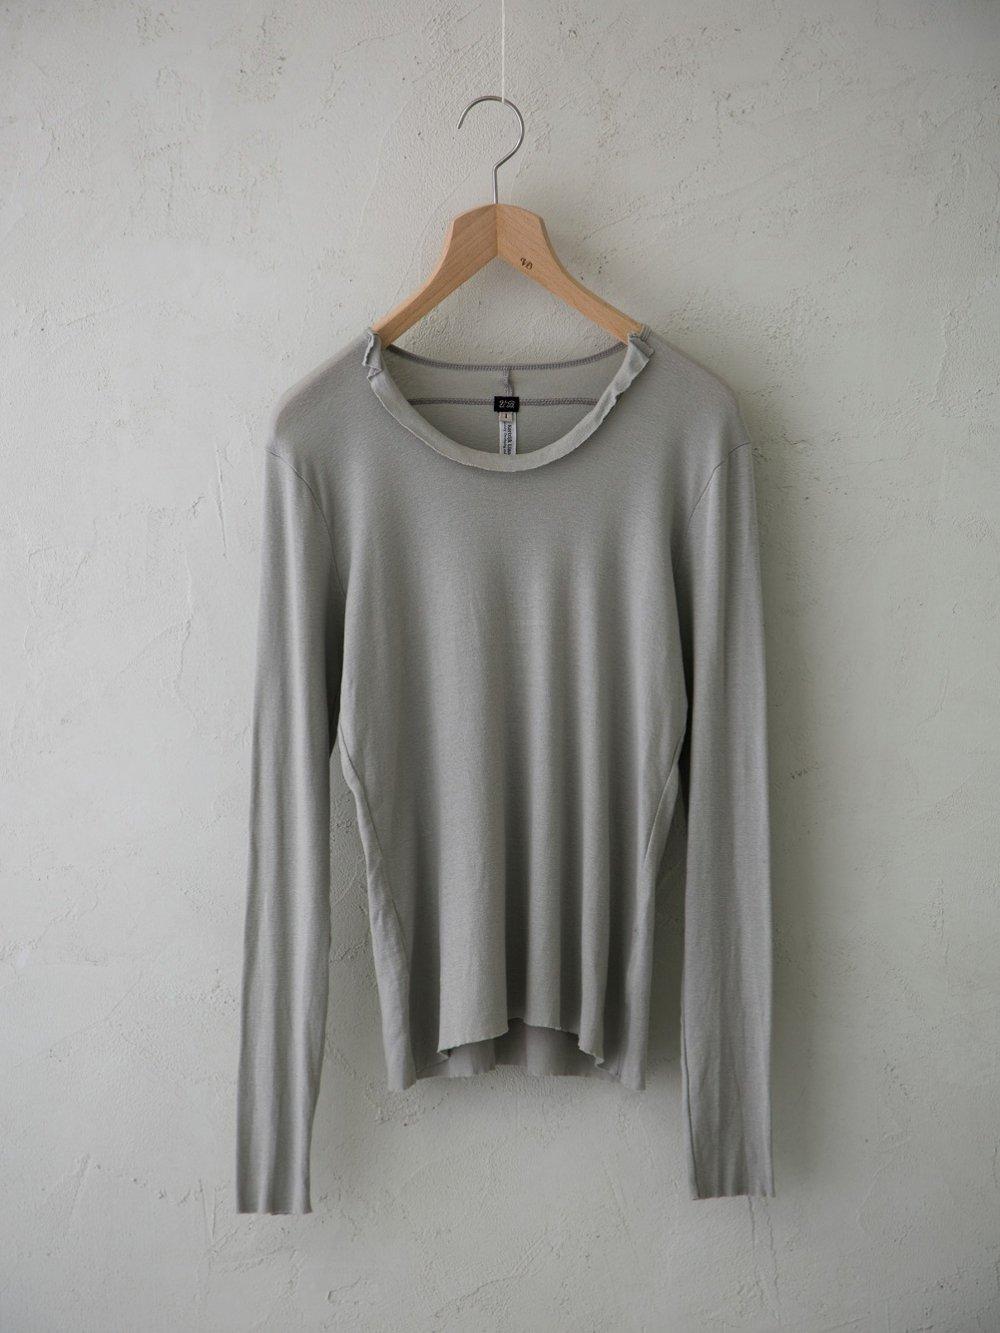 & 12 Linen(フライス)フリルプルオーバー -standard-